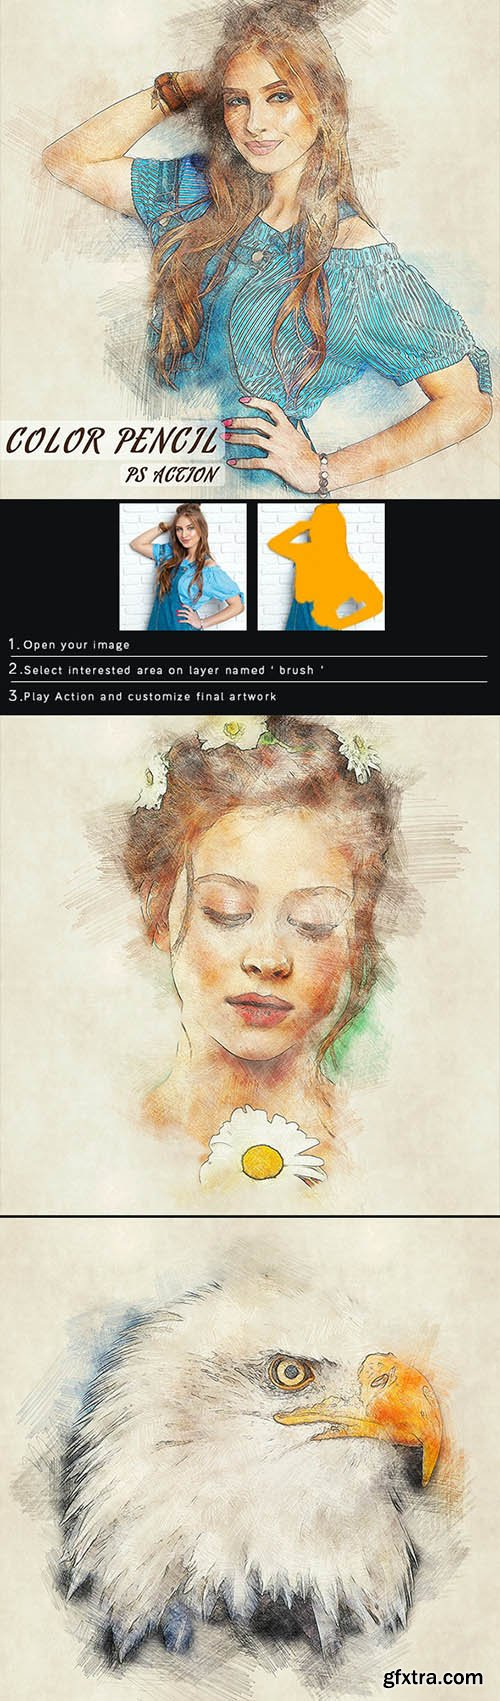 GraphicRiver - Color Pencil Photoshop Action 28081085